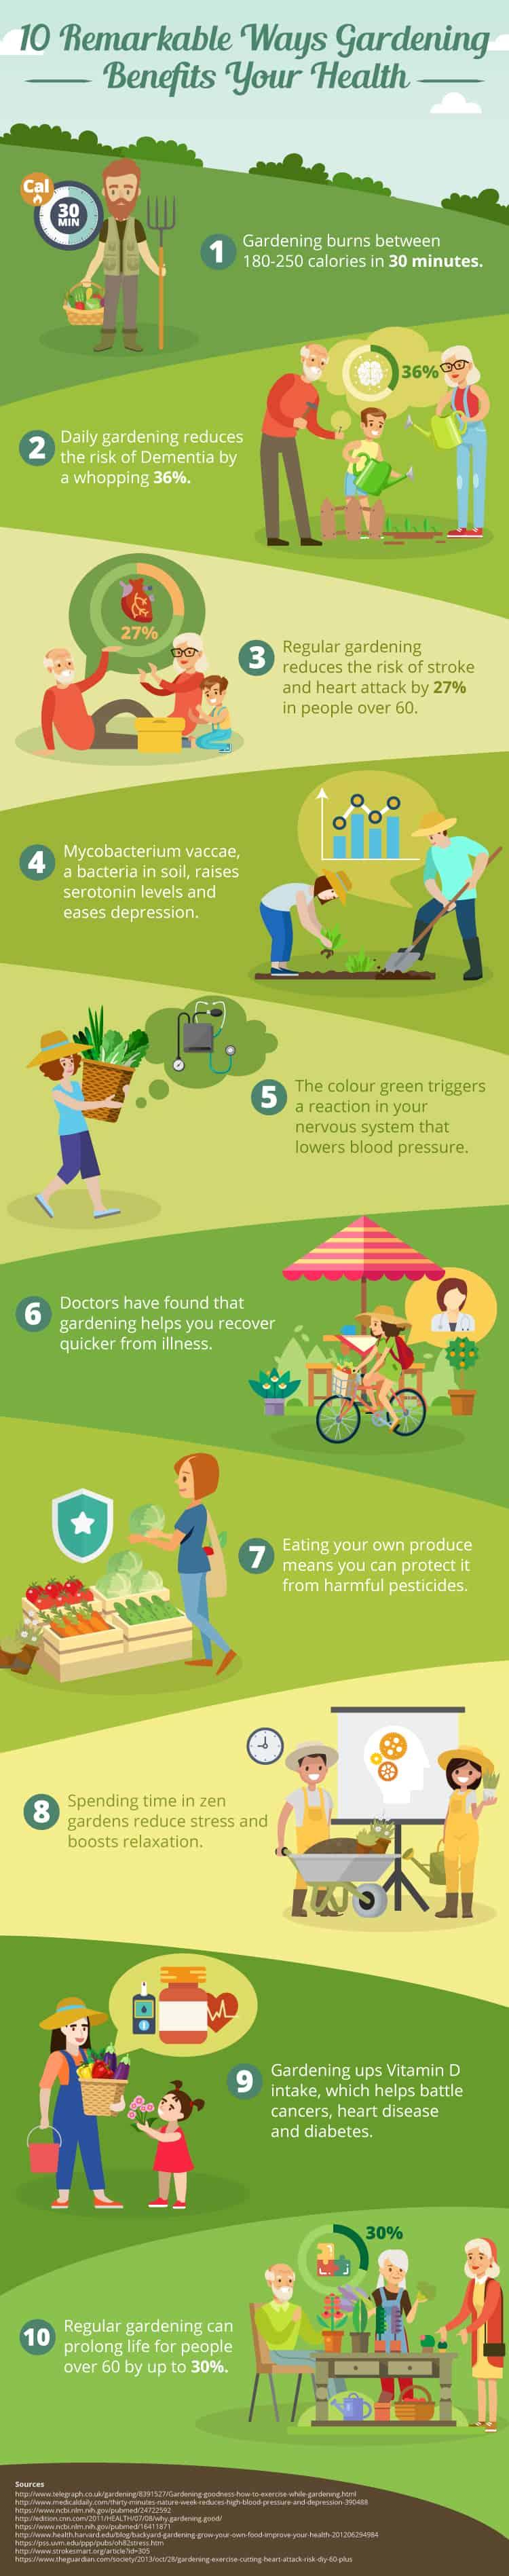 10 Remarkable Ways Gardening Benefits Your Health